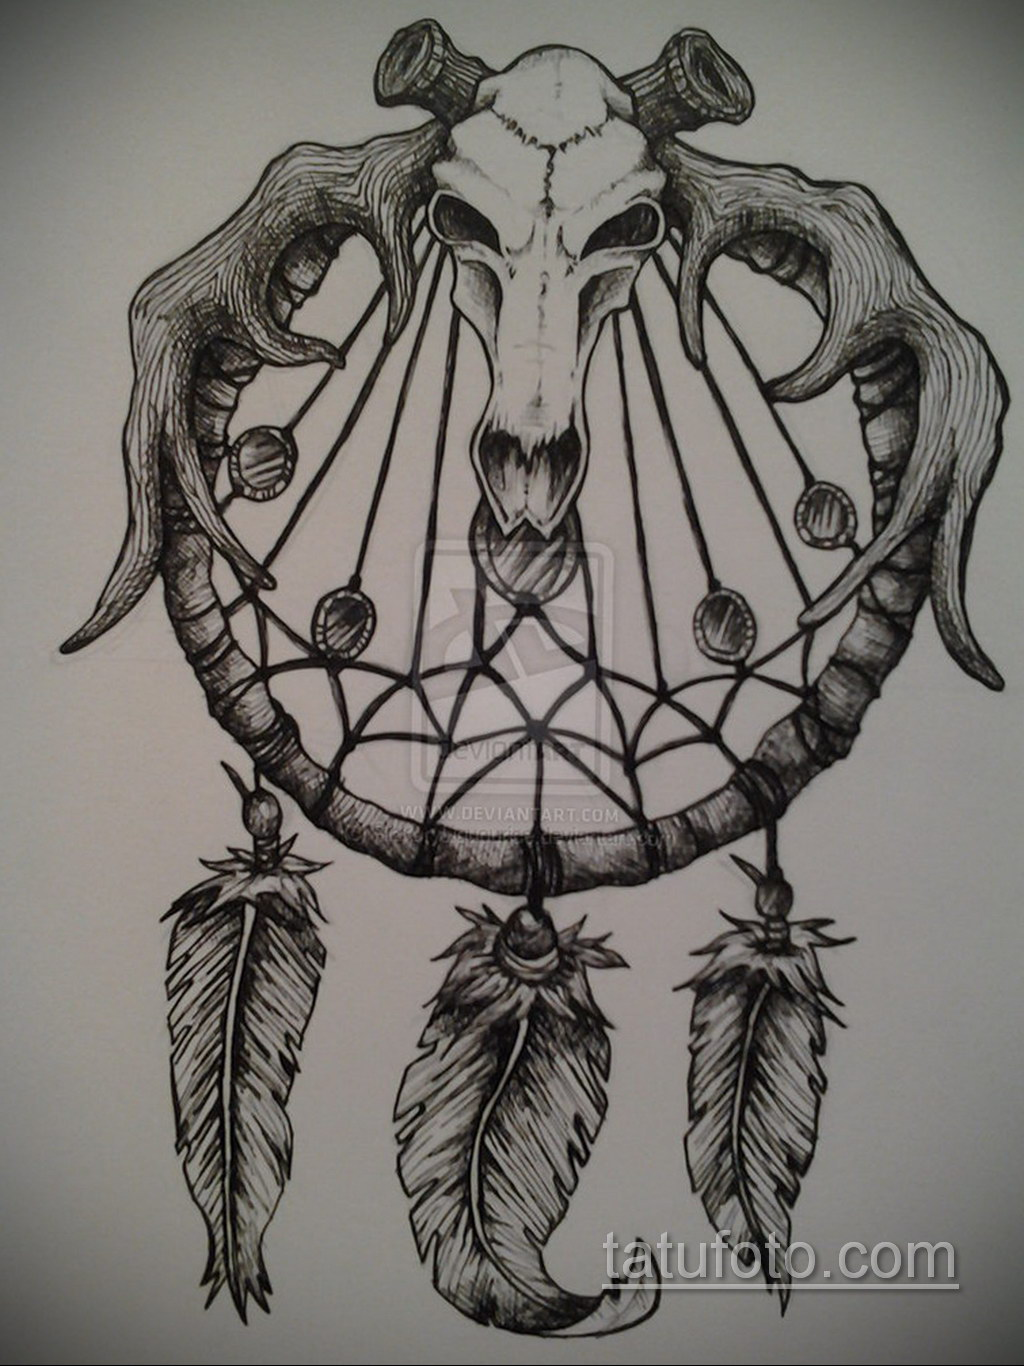 Фото рисунка тату с ловцом снов 22.11.2020 №673 -Dreamcatcher tattoo- tatufoto.com